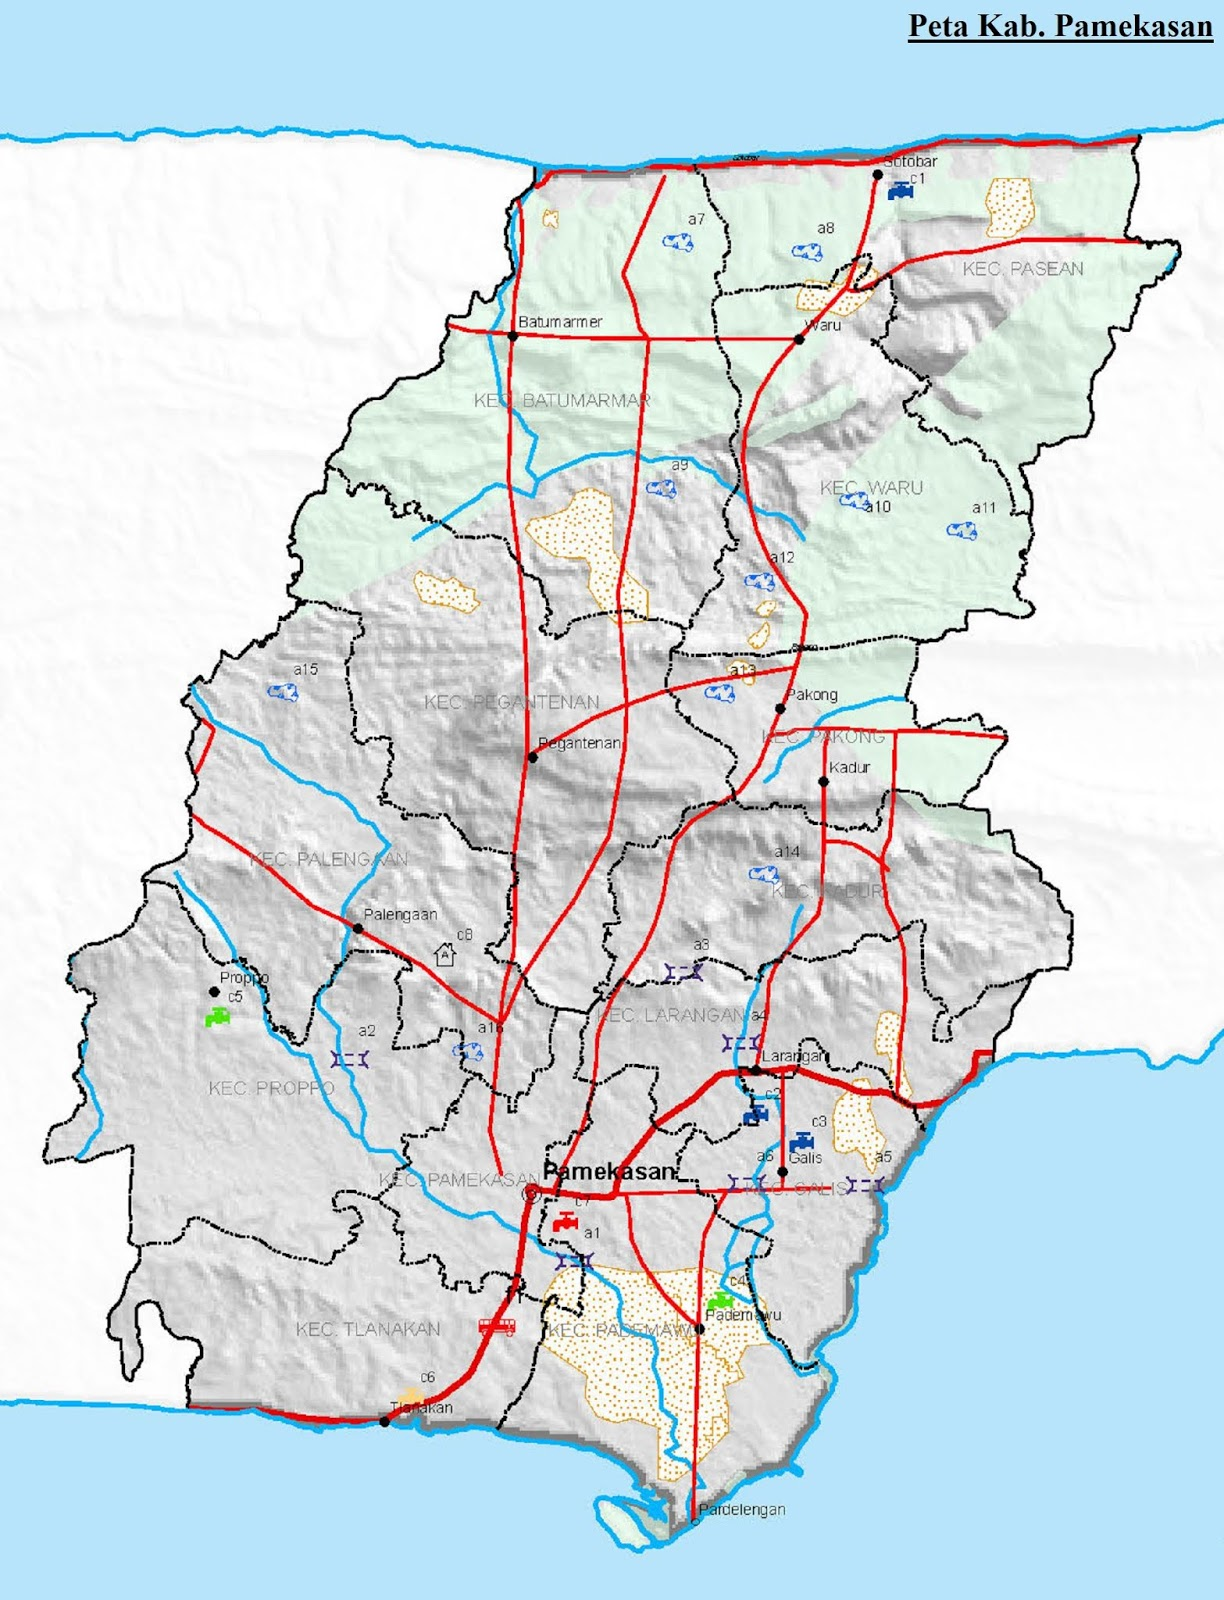 Gambar Peta Kabupaten Pamekasan HD